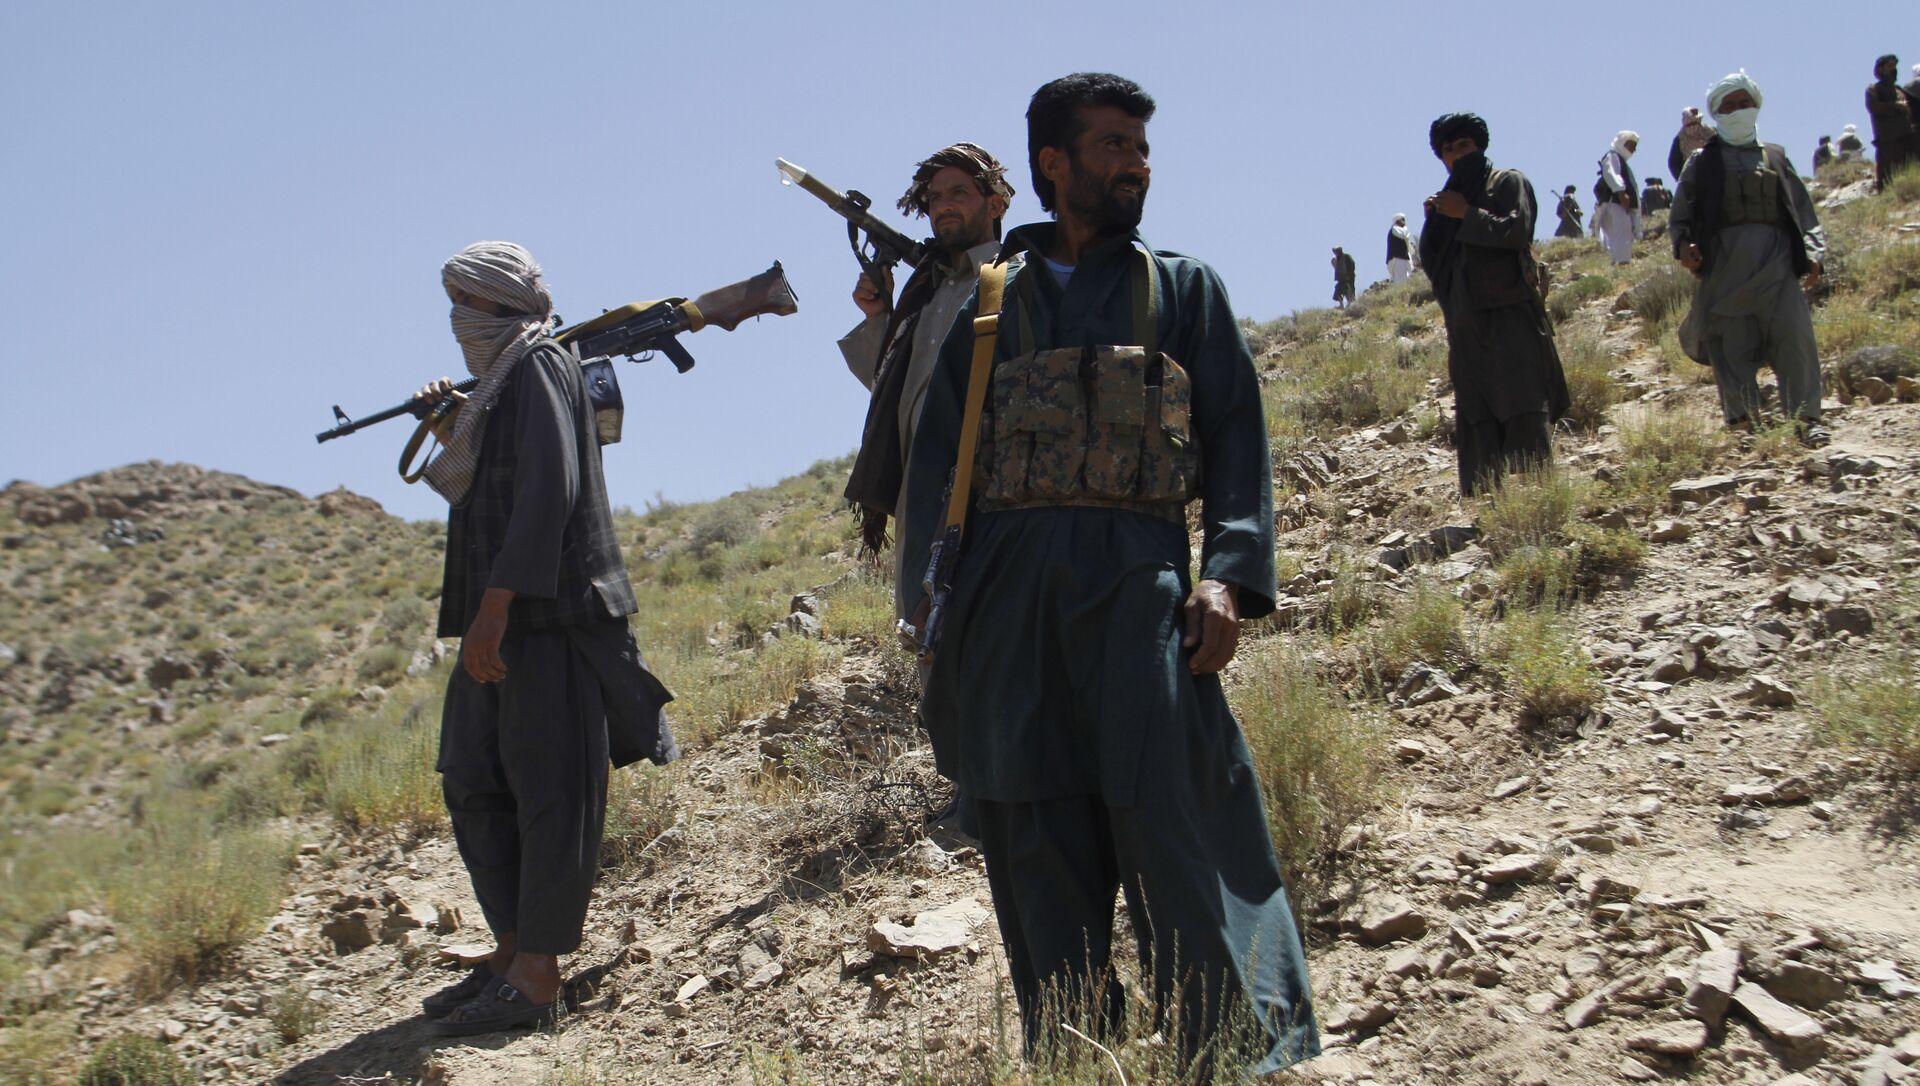 Taliban militants. (File) - Sputnik International, 1920, 14.07.2021